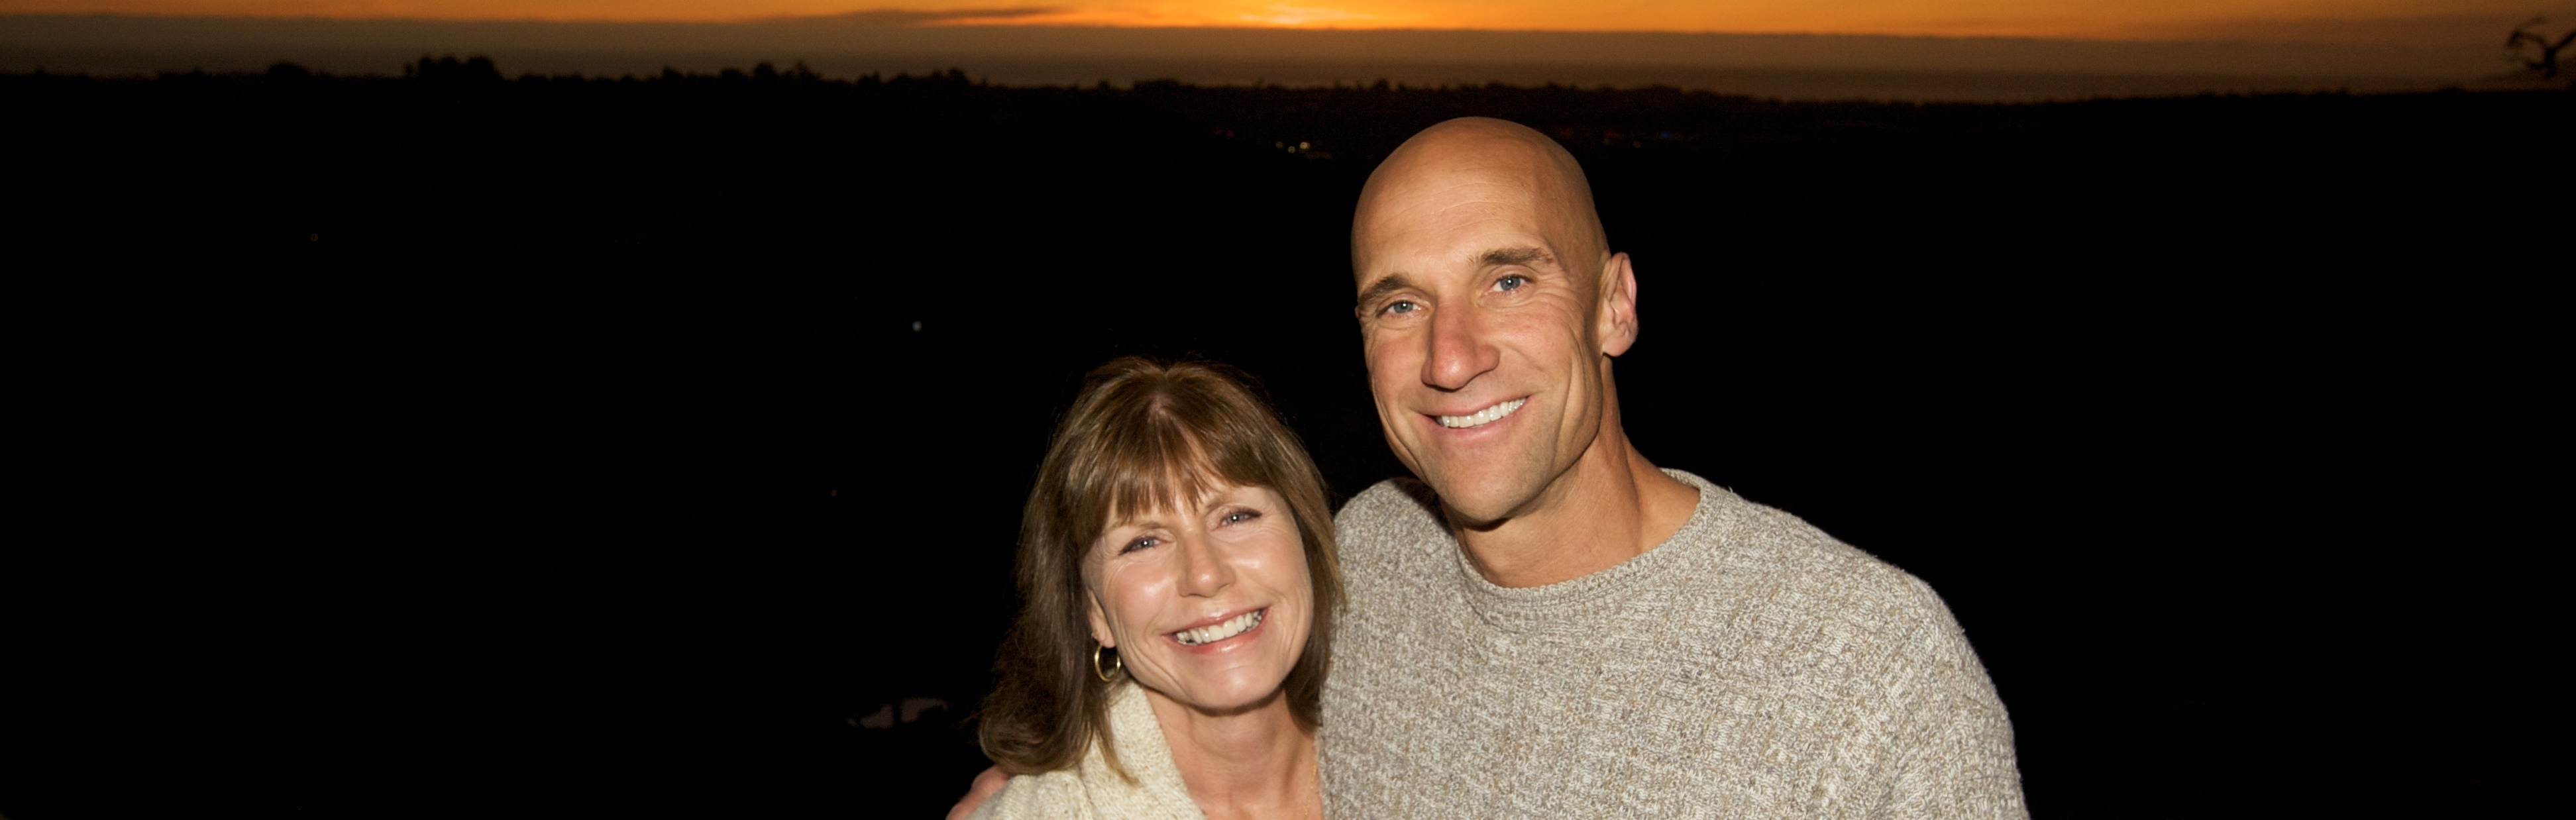 Paul and Sherri: Home Masters